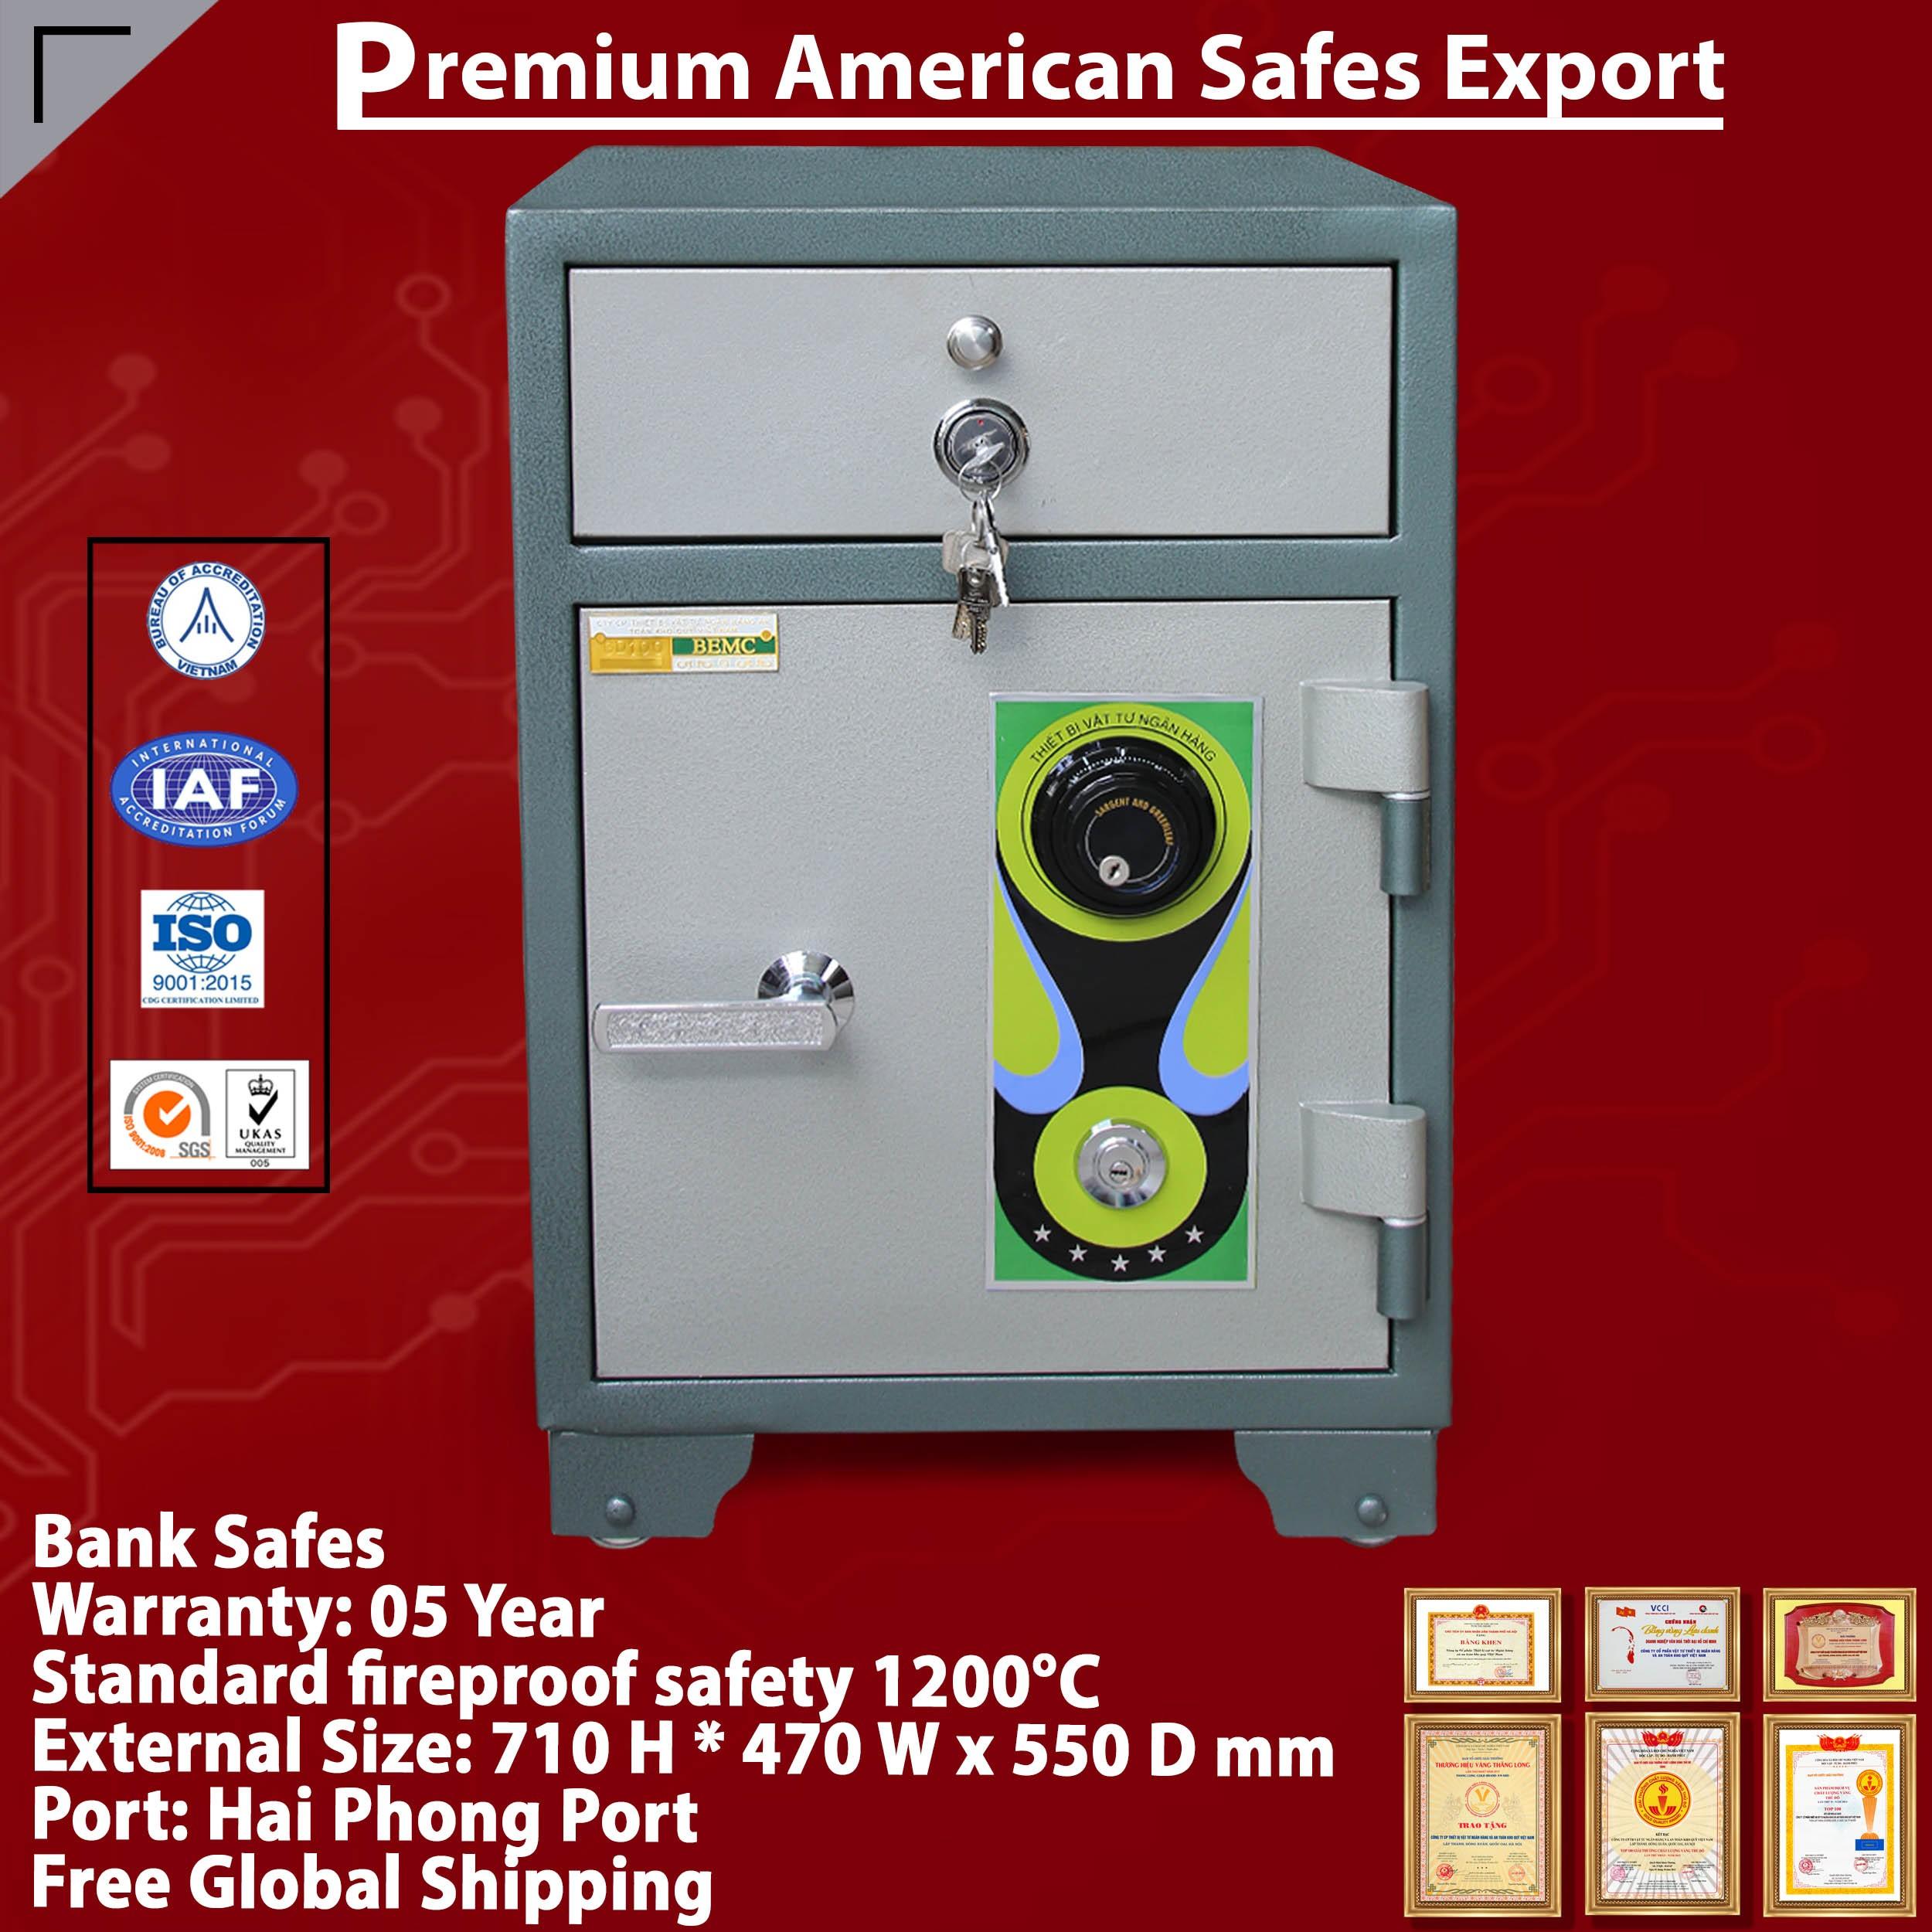 Safe Deposit Box Manufacturing Facility